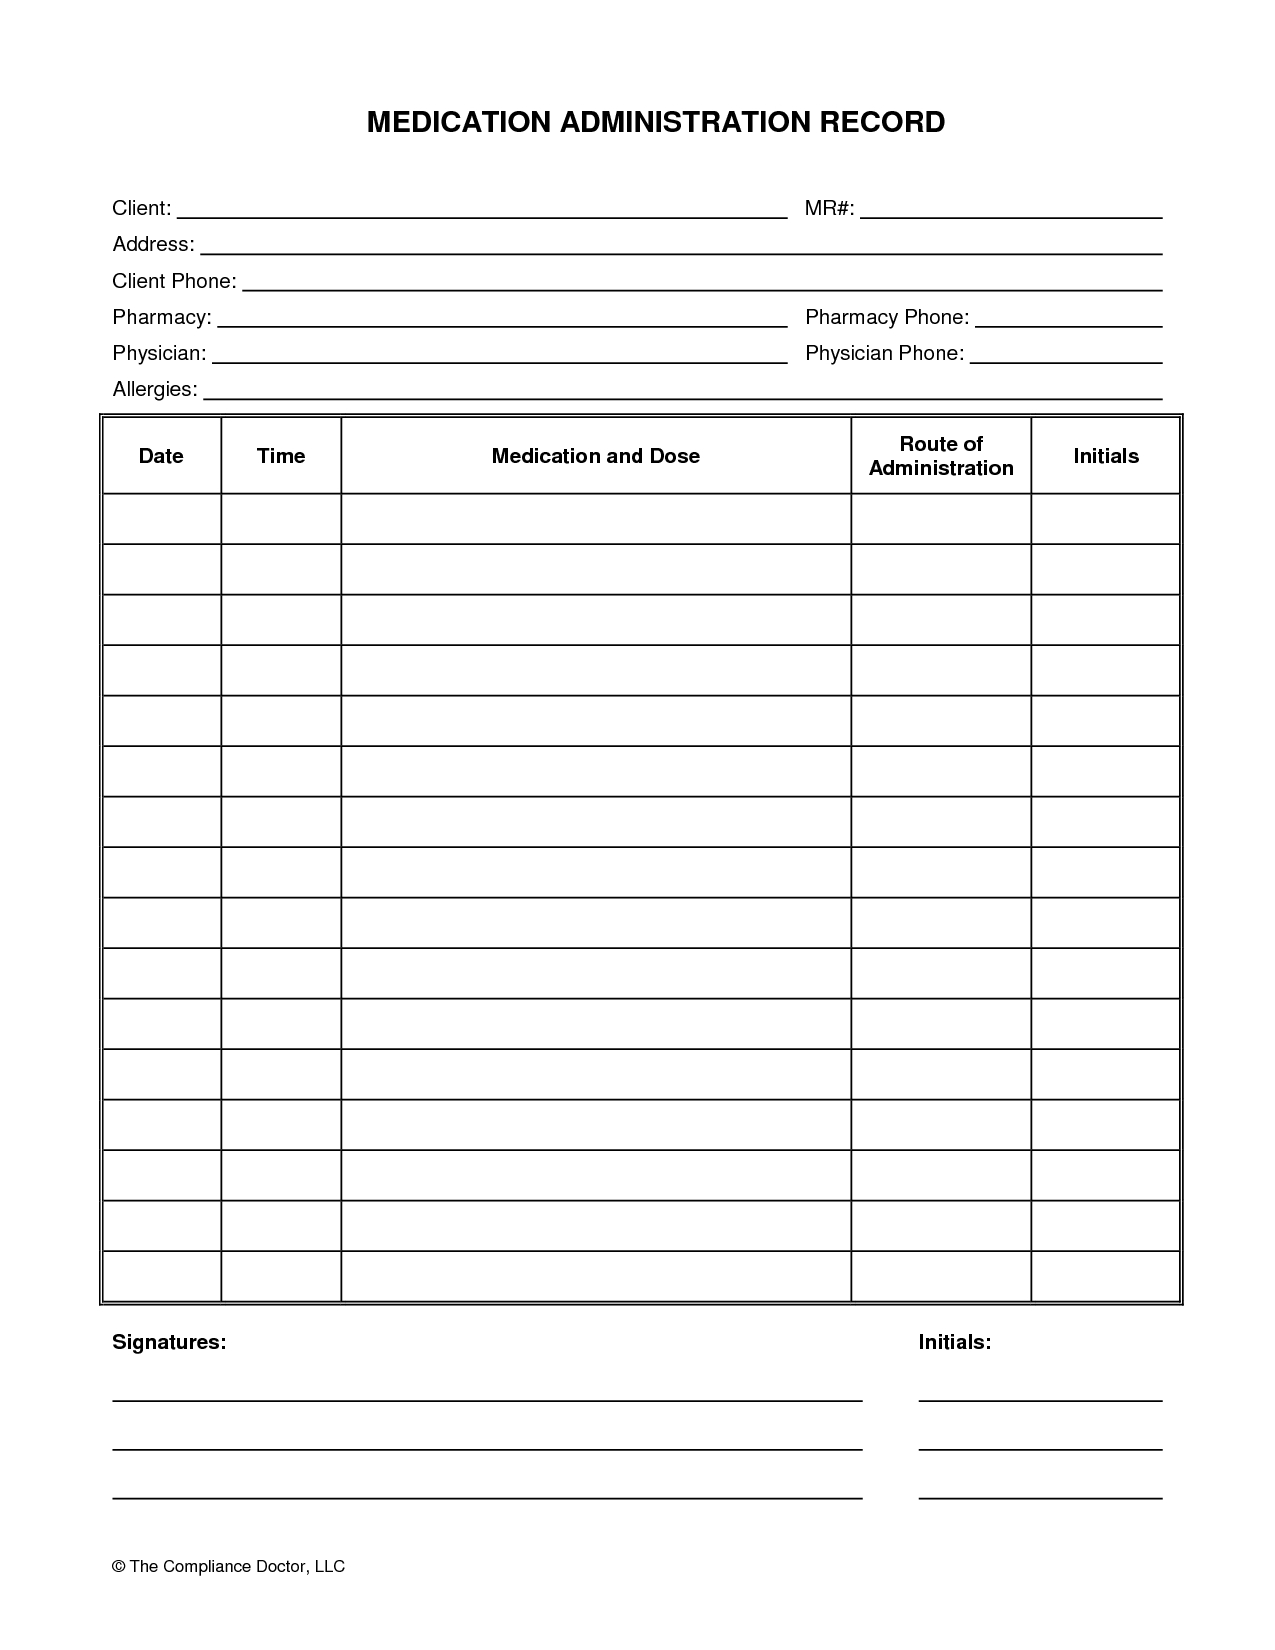 Medication Administration Record Form   Organization   Medication with Printable 30 Day Medication Sheet